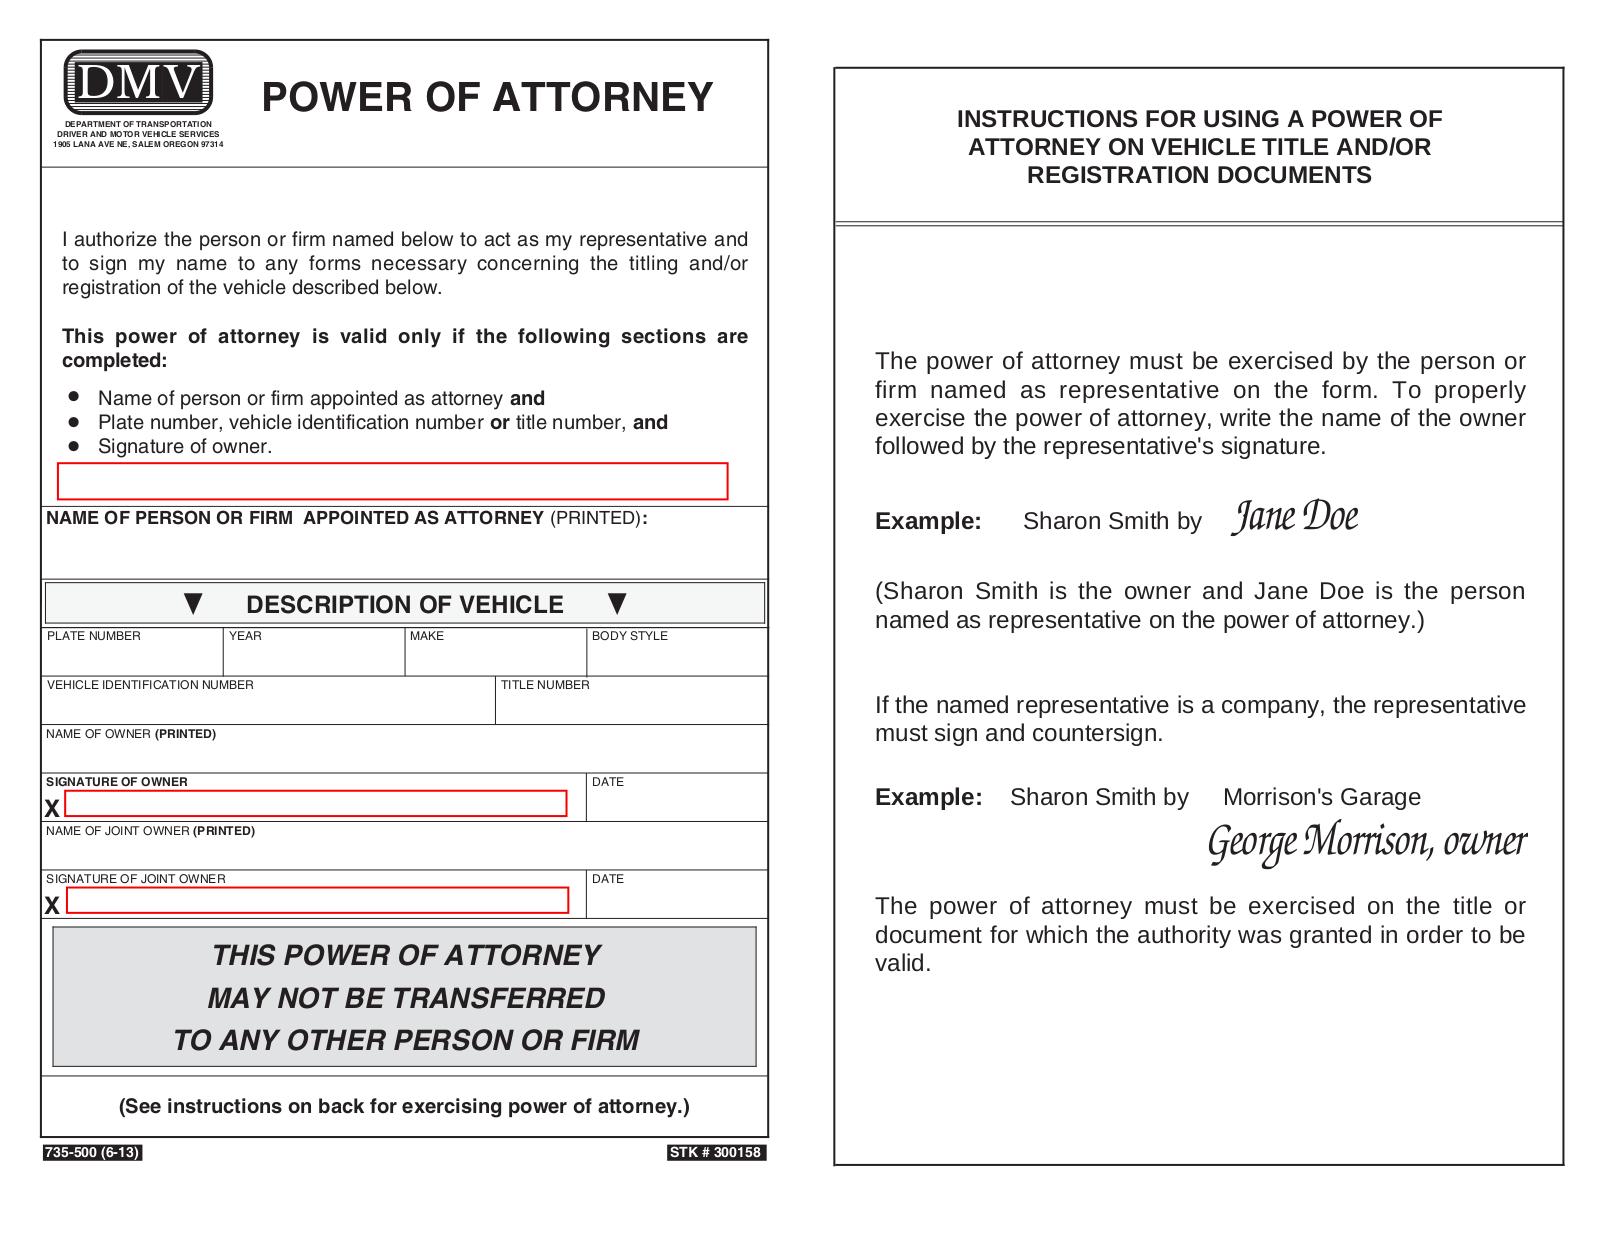 power of attorney form dmv  Oregon Motor Vehicle Power of Attorney (Form 12-12 ...